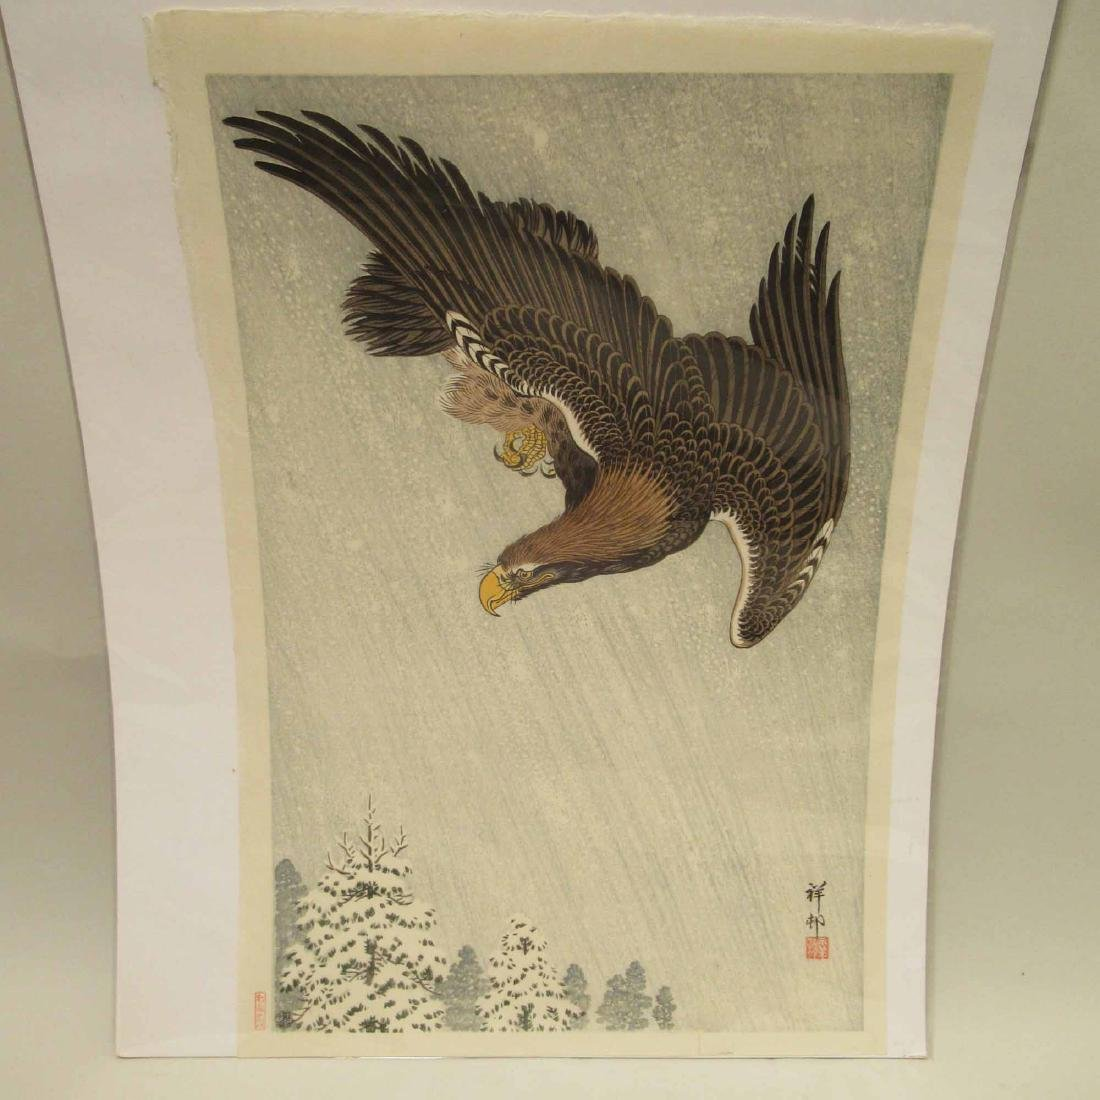 ORIENTAL PRINT OF EAGLE